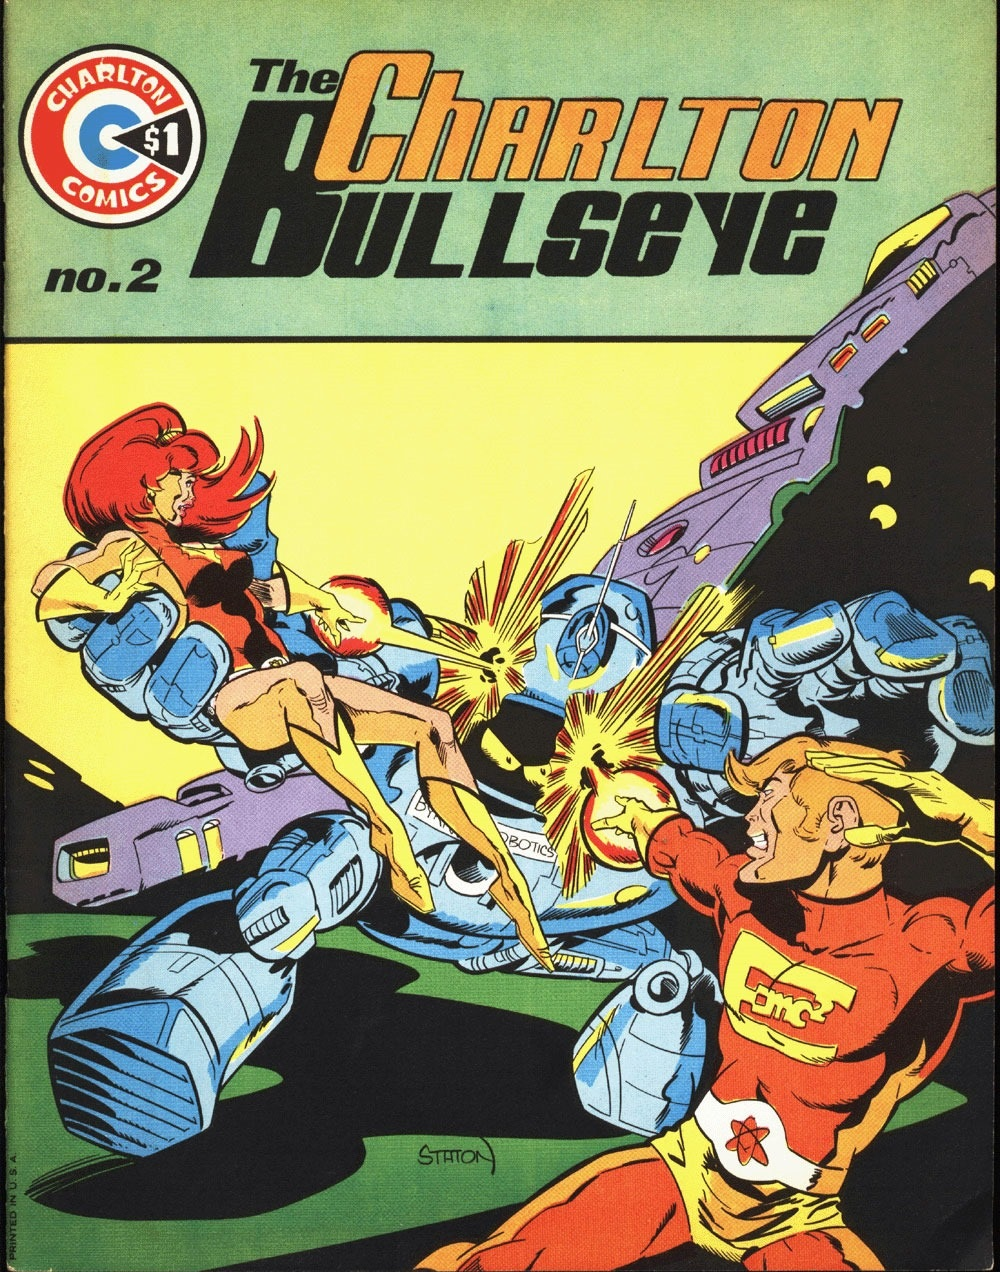 Charlton Bullseye (1975) #2, cover by Joe Staton.